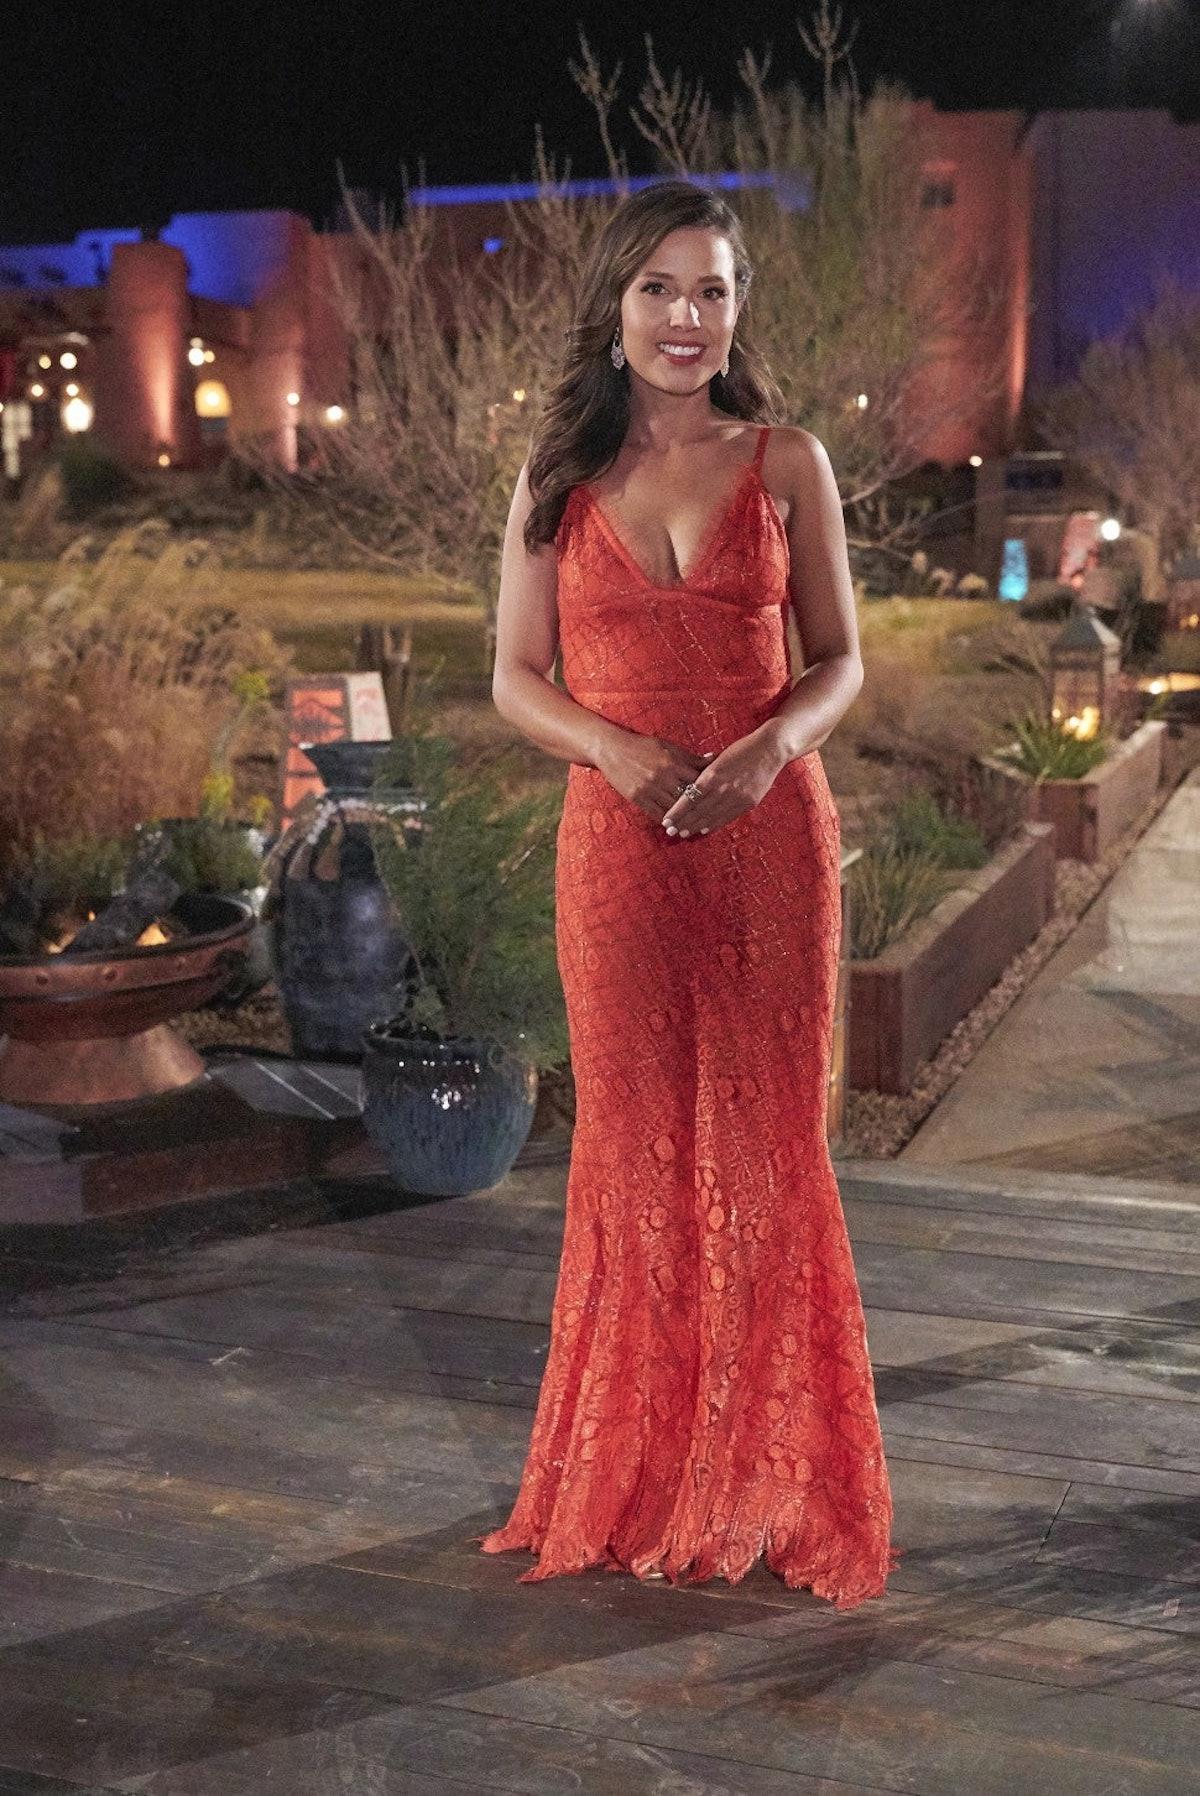 Katie Thurston in 'The Bachelorette' Season 17.